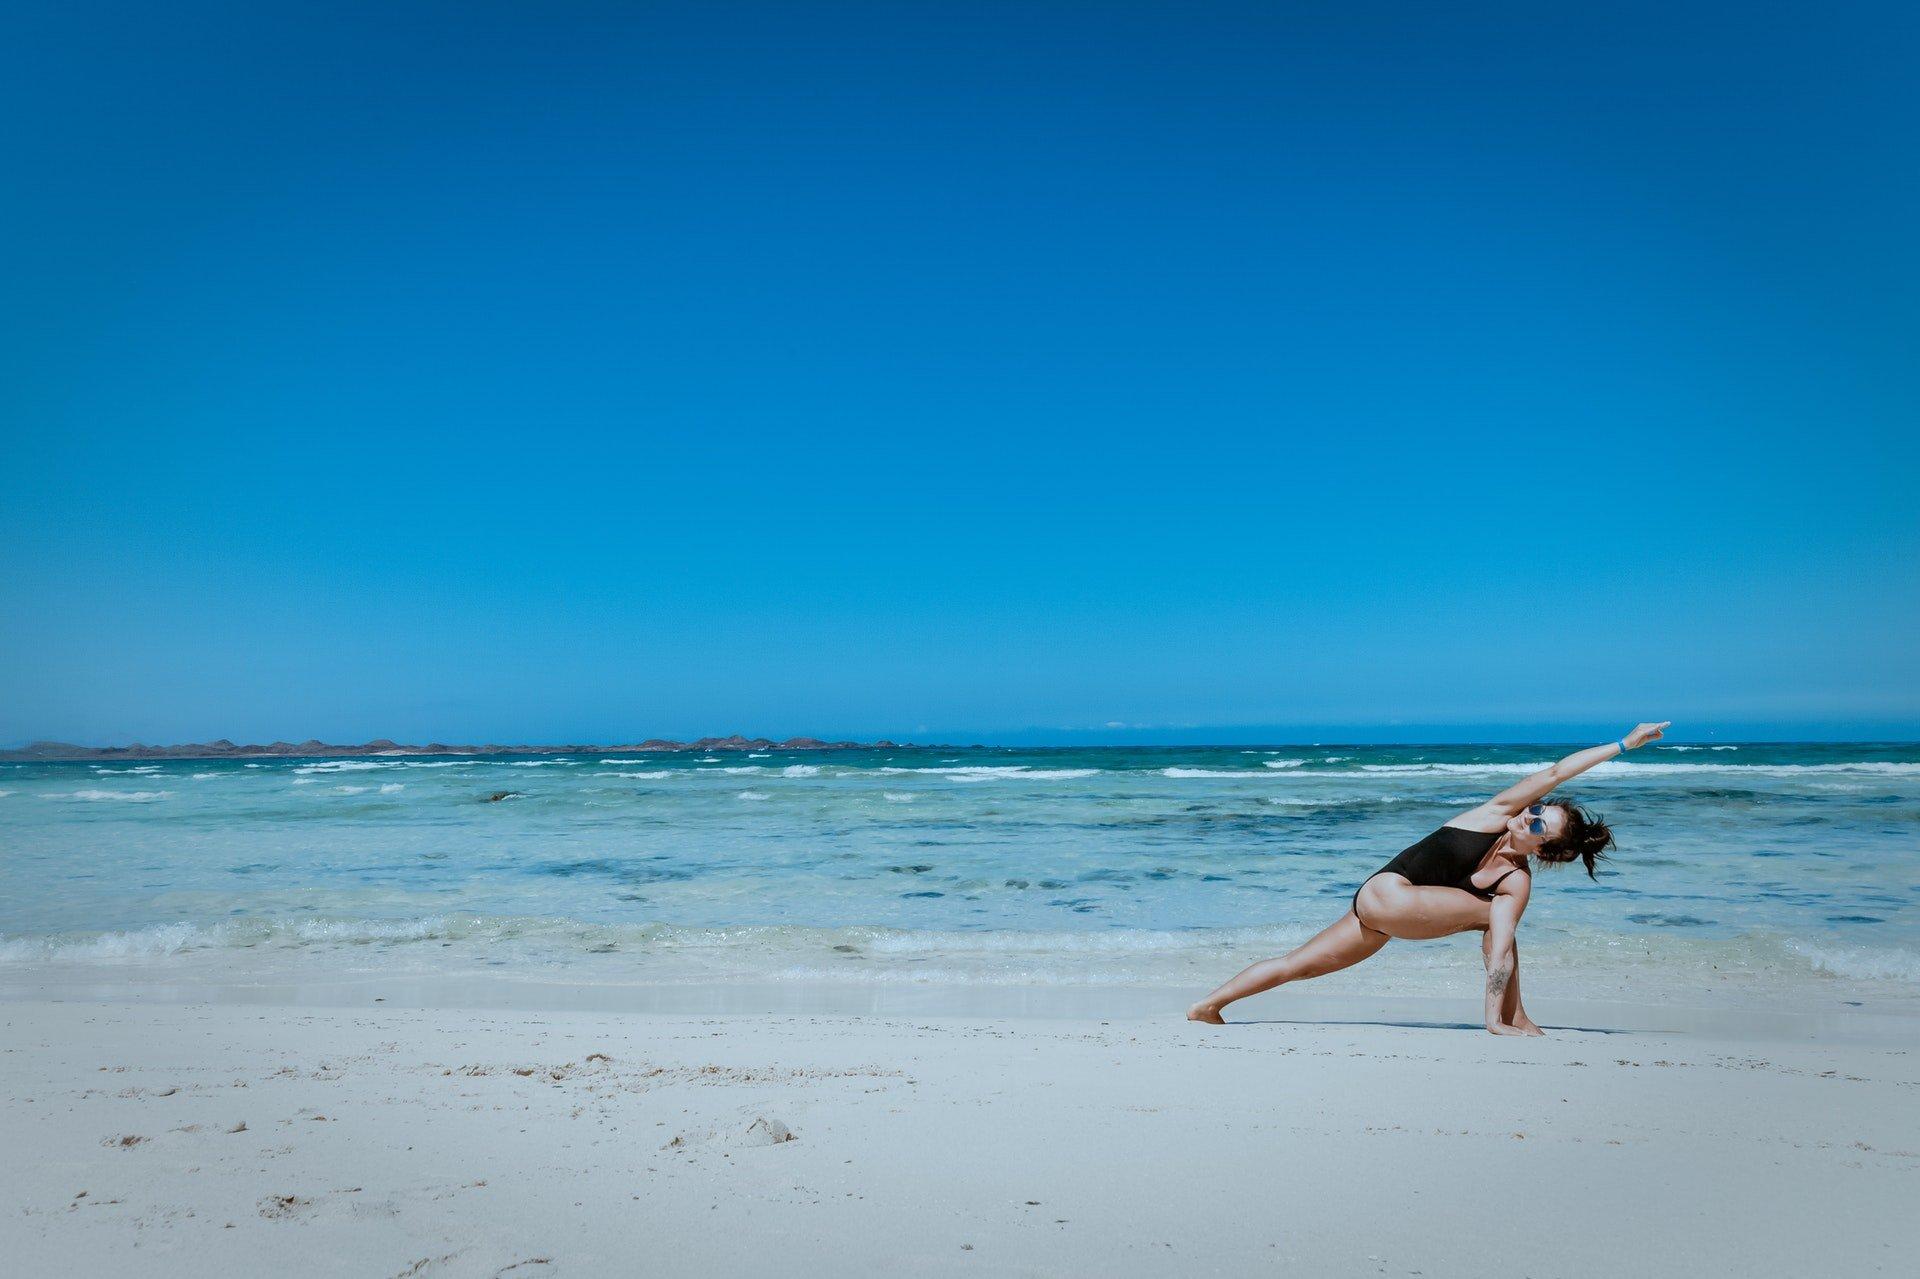 Yoga: The Amazing Benefits of Daily Practice